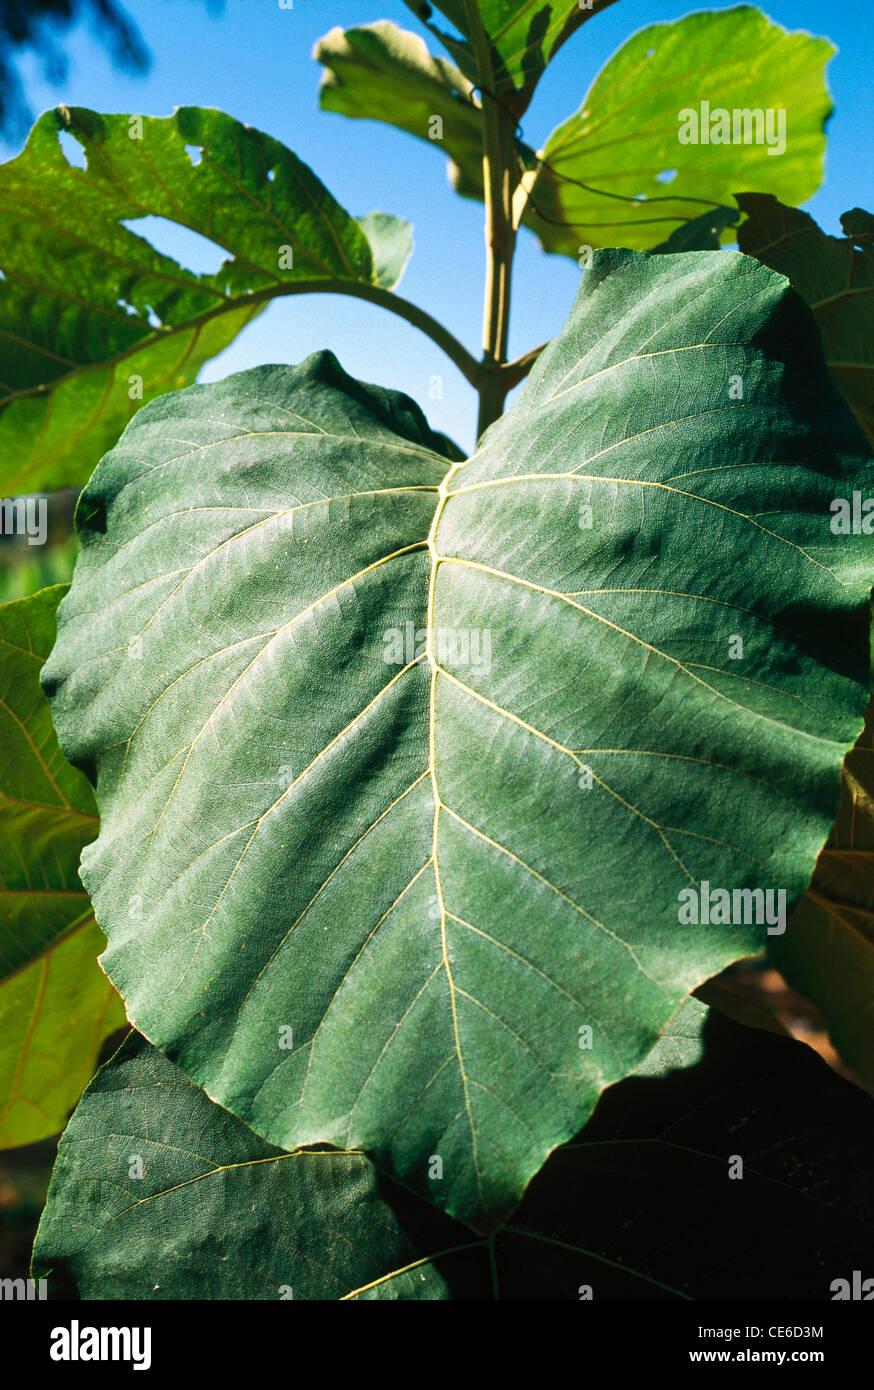 Teakbaum blatt  Teak-Baum Bäumchen Blatt; Gujarat; Indien Stockfoto, Bild: 43167928 ...